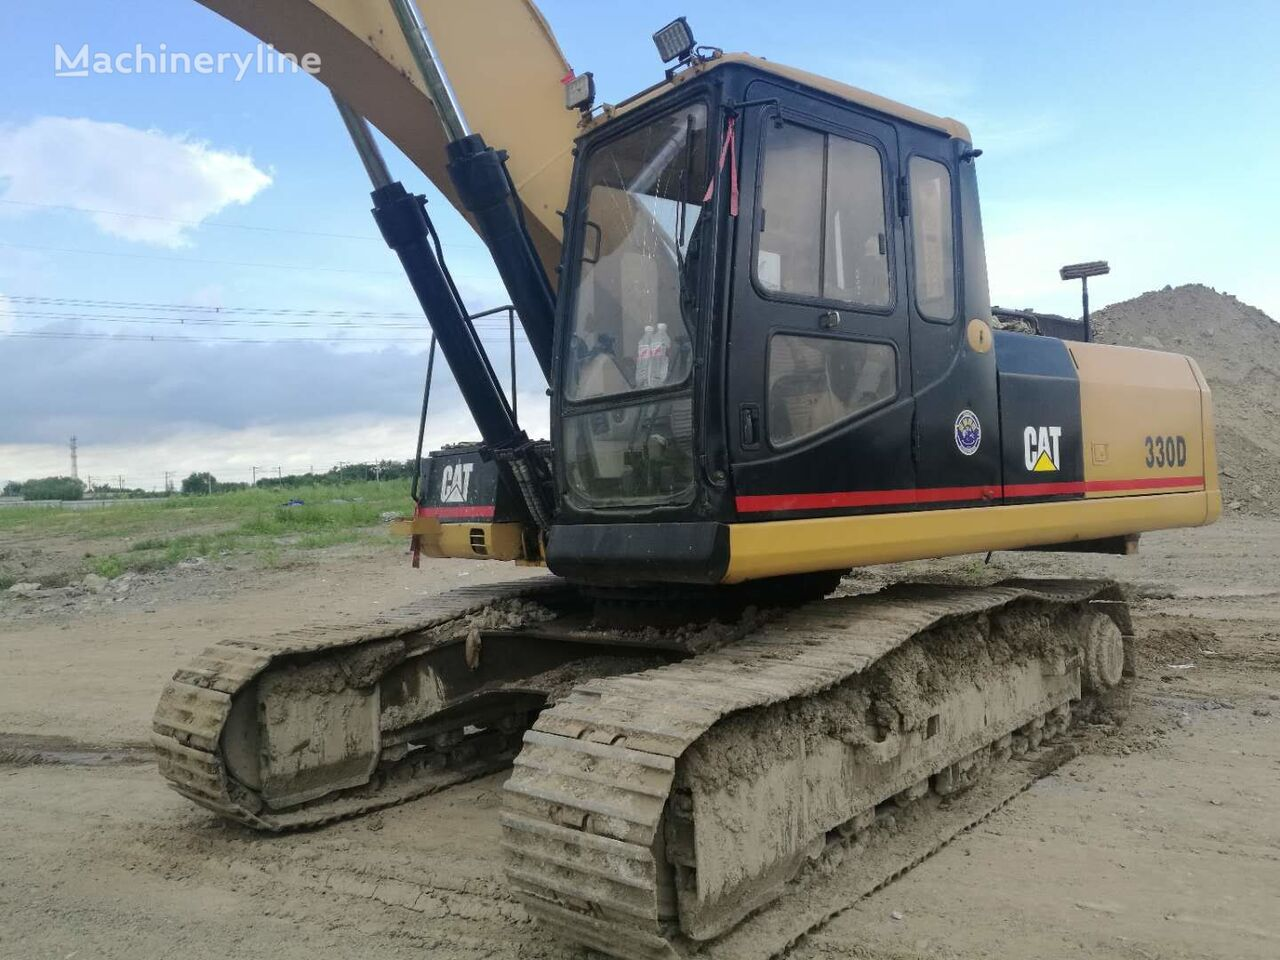 CATERPILLAR 330DL tracked excavator